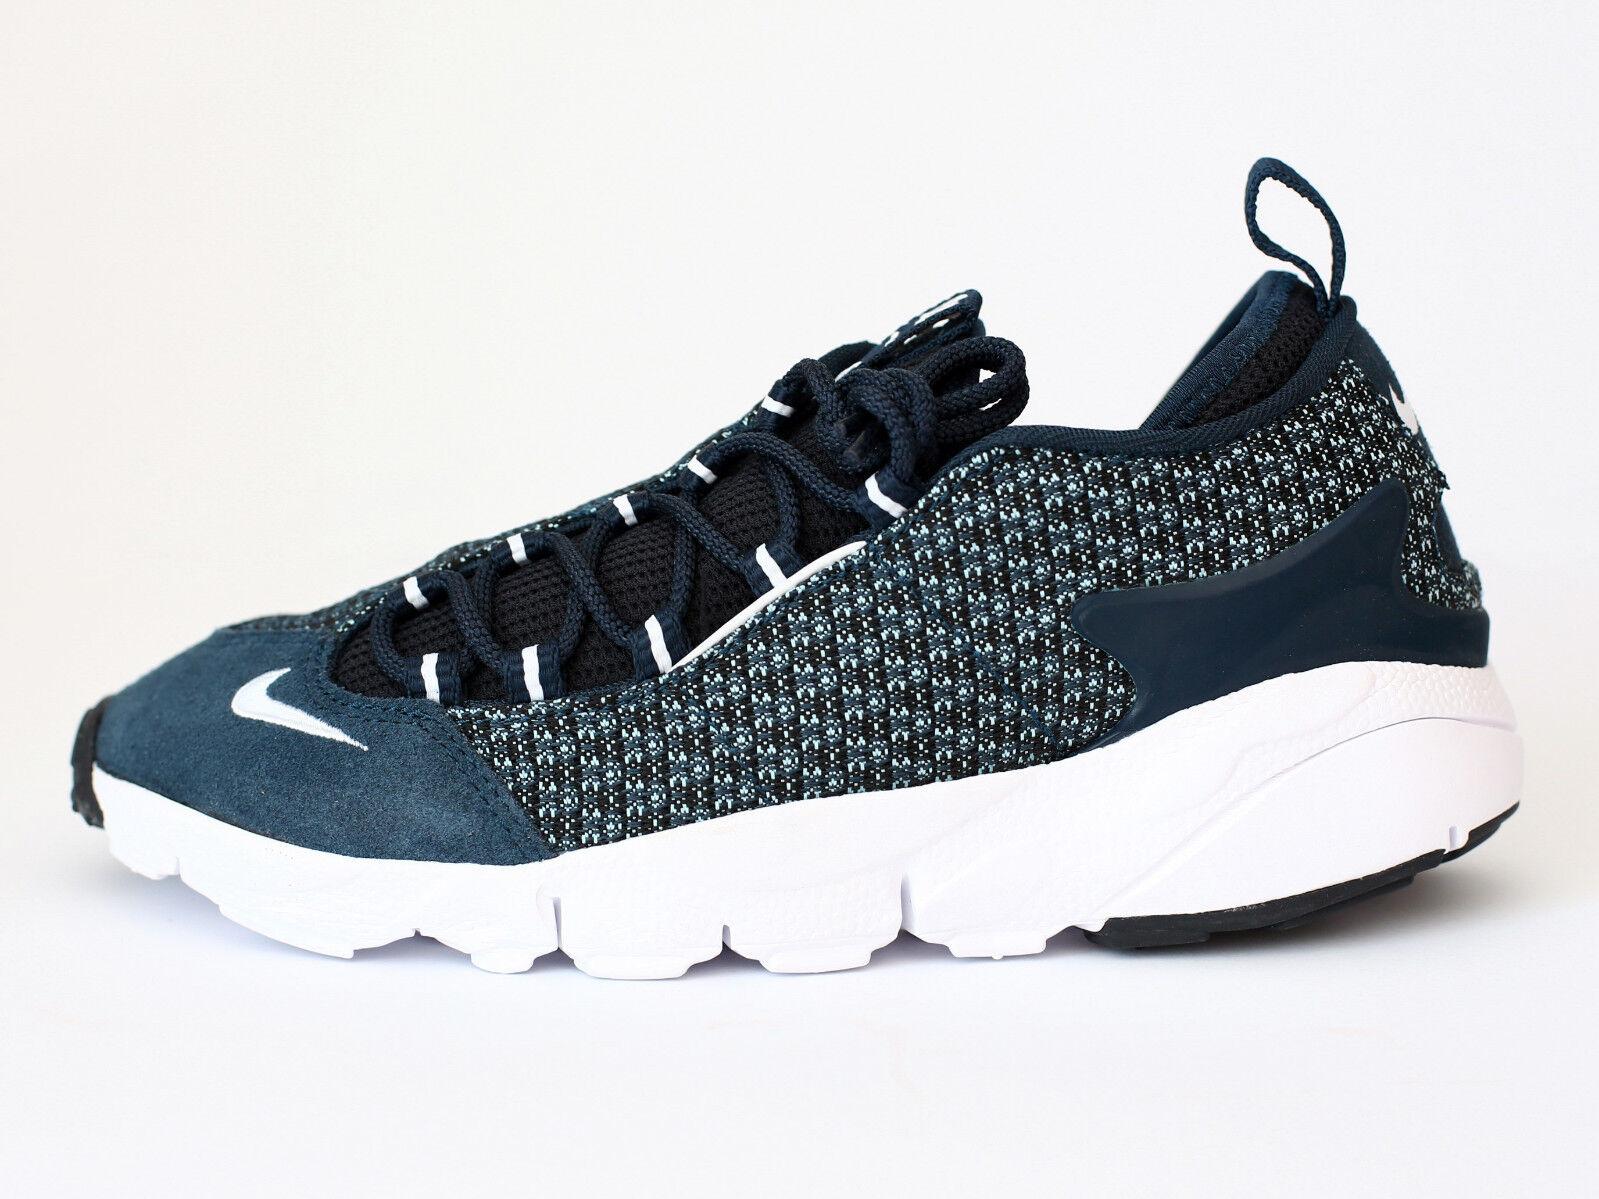 Nike Air Footscape NM JCRD (898007-400) Herren Sneaker - Blau - Gr. 46 - Neu (S)